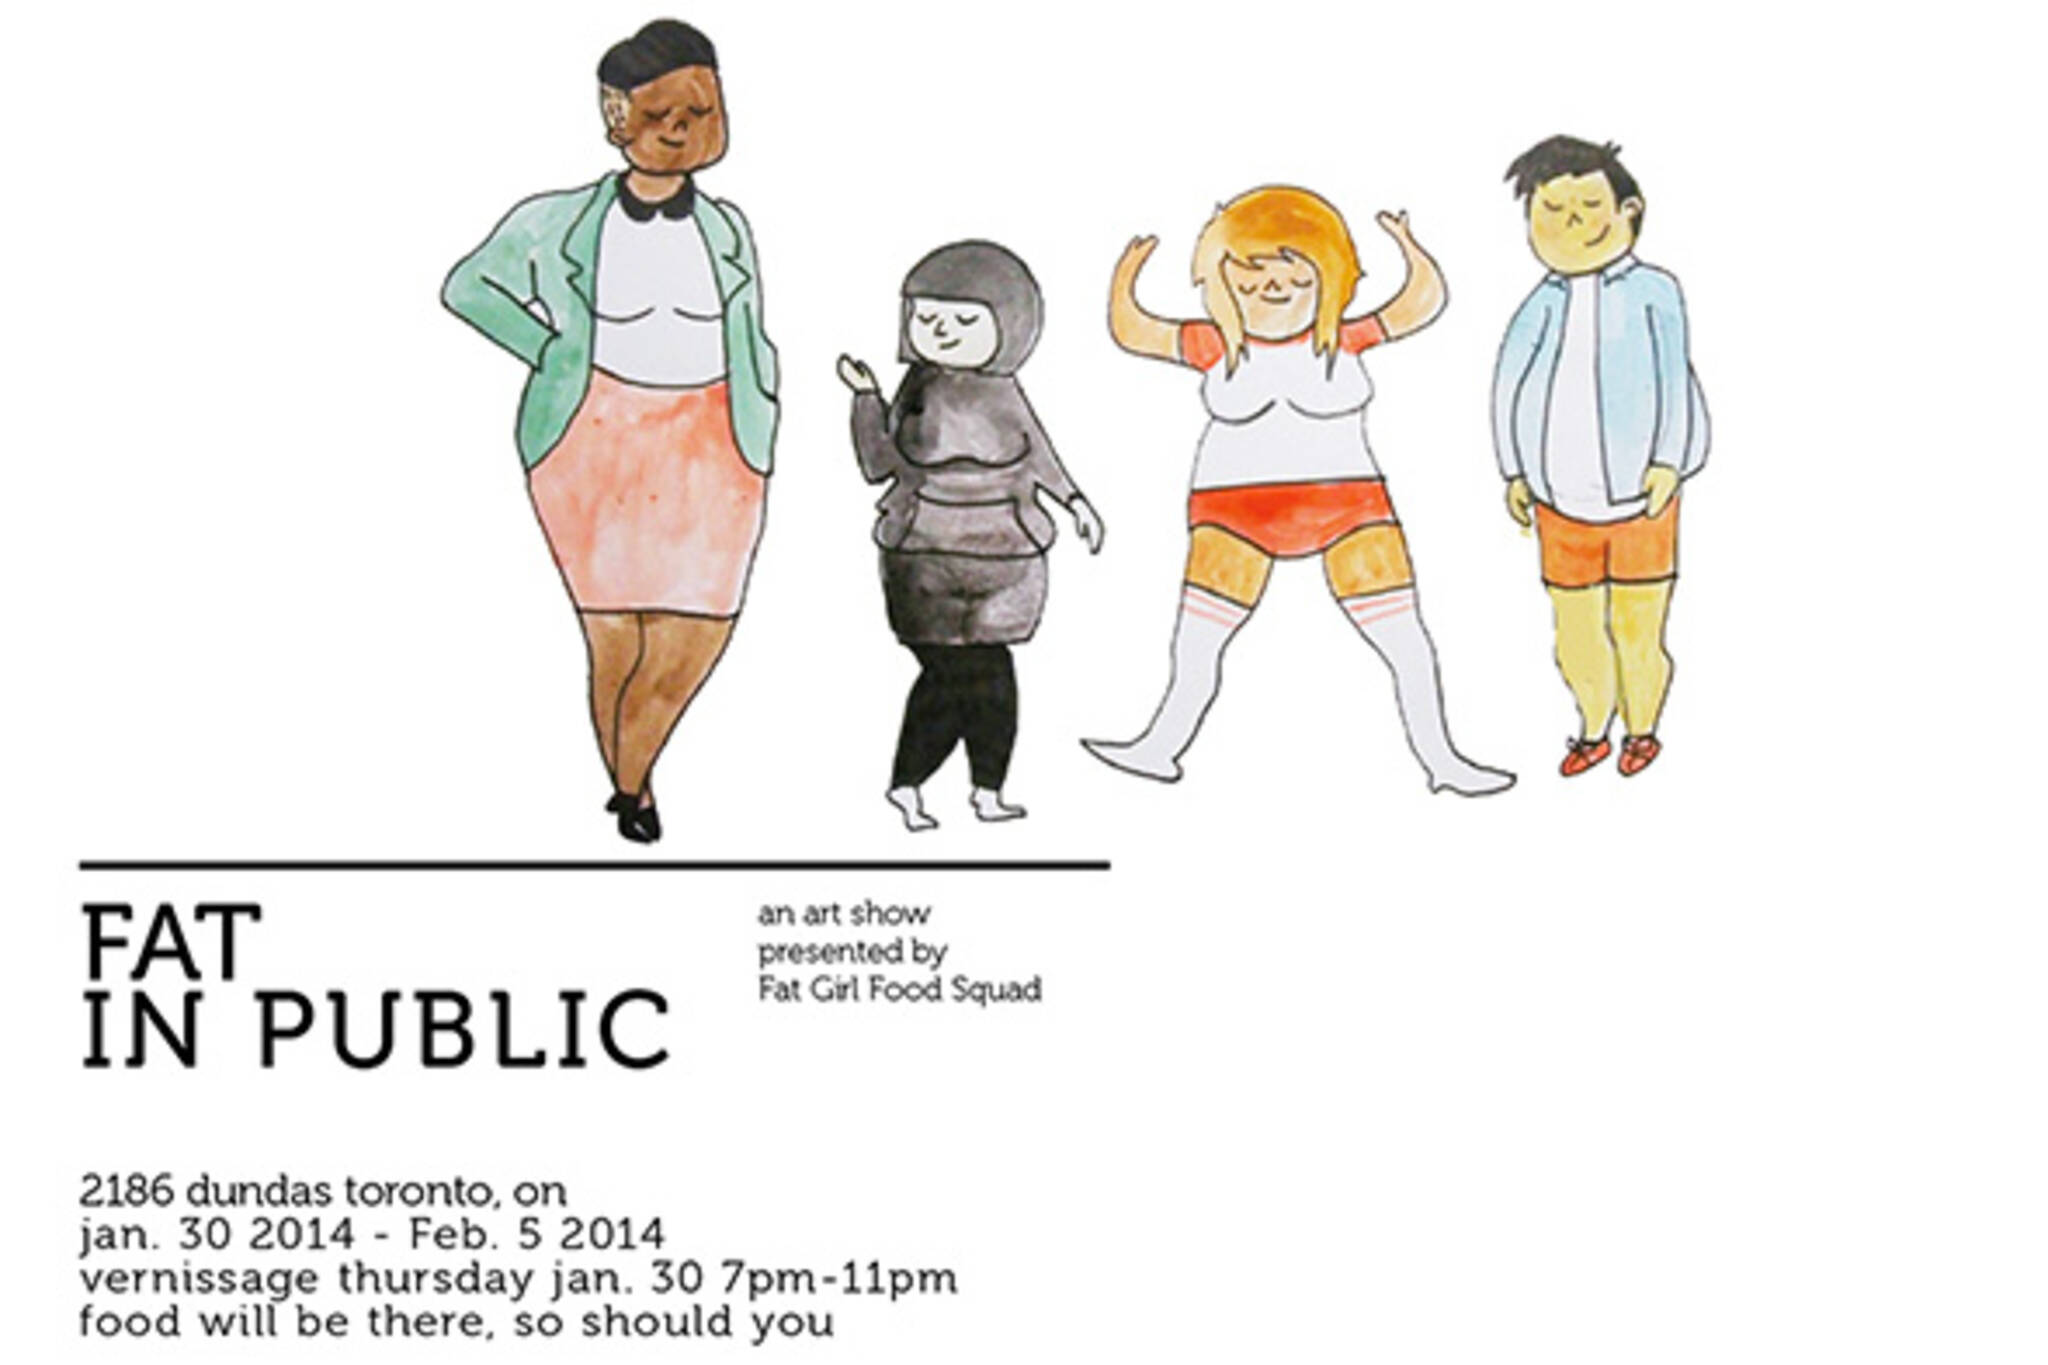 Fat in public art show toronto